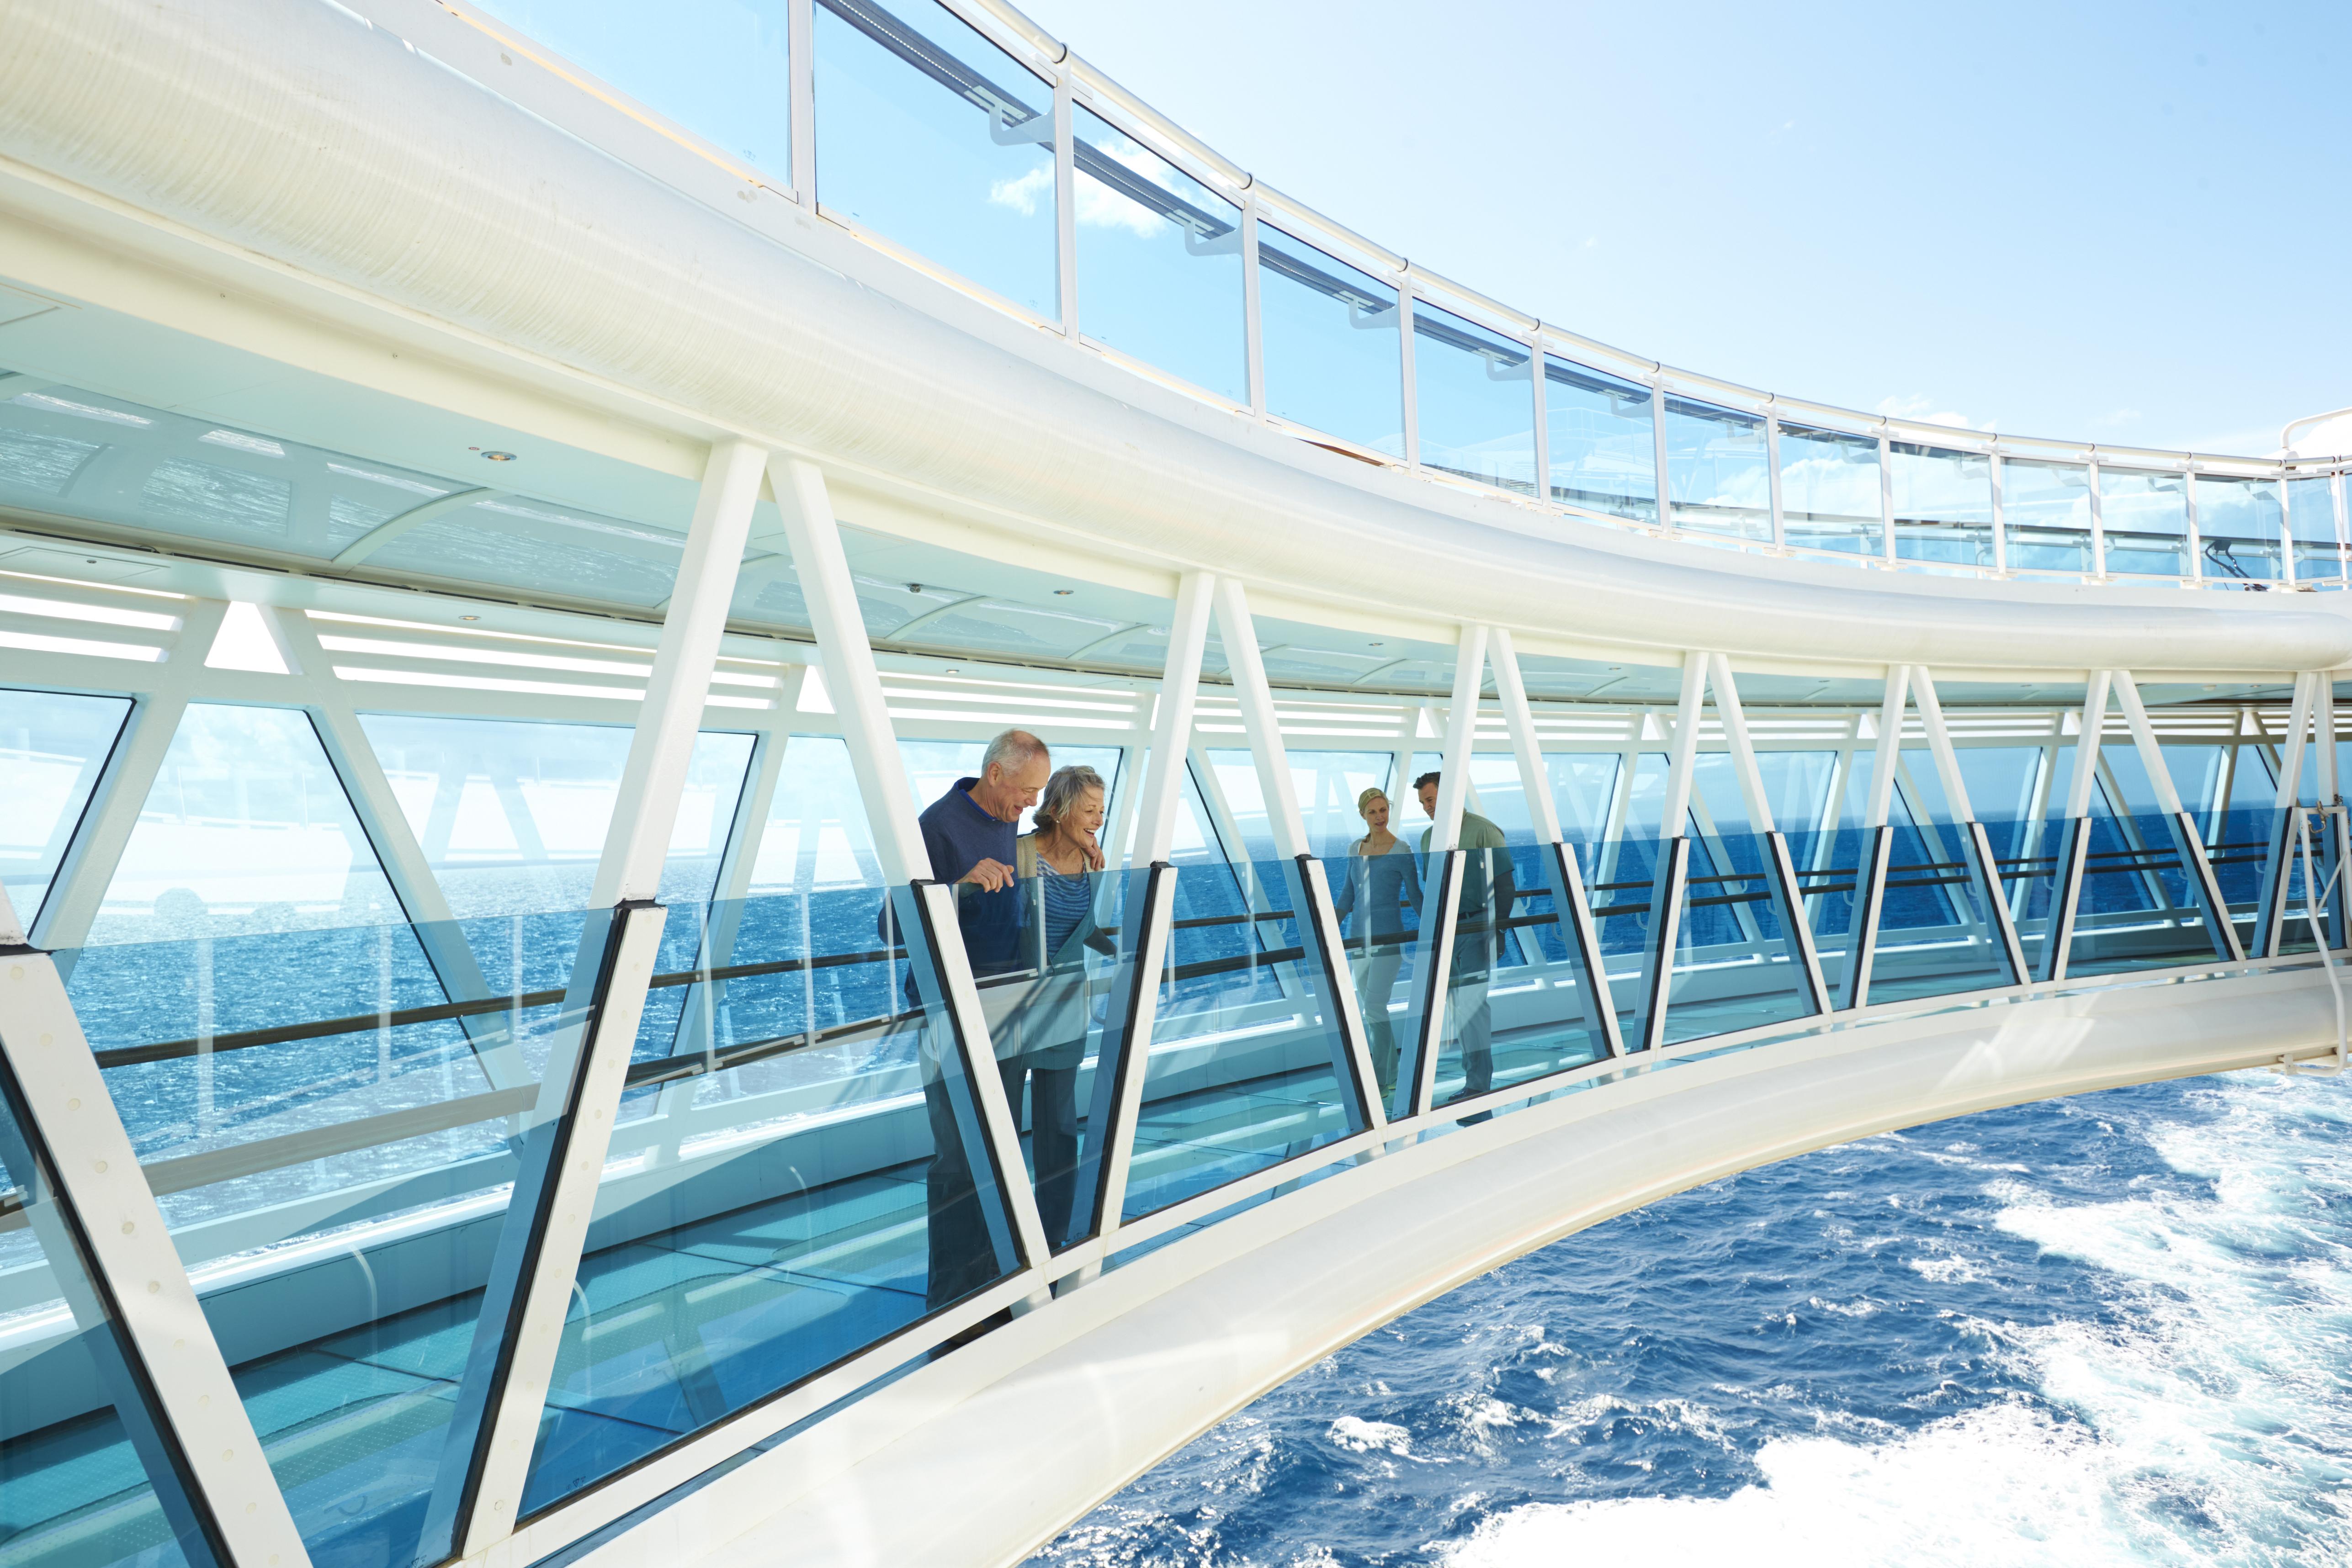 Princess Cruises Royal Class Interior seawalk 4.jpg